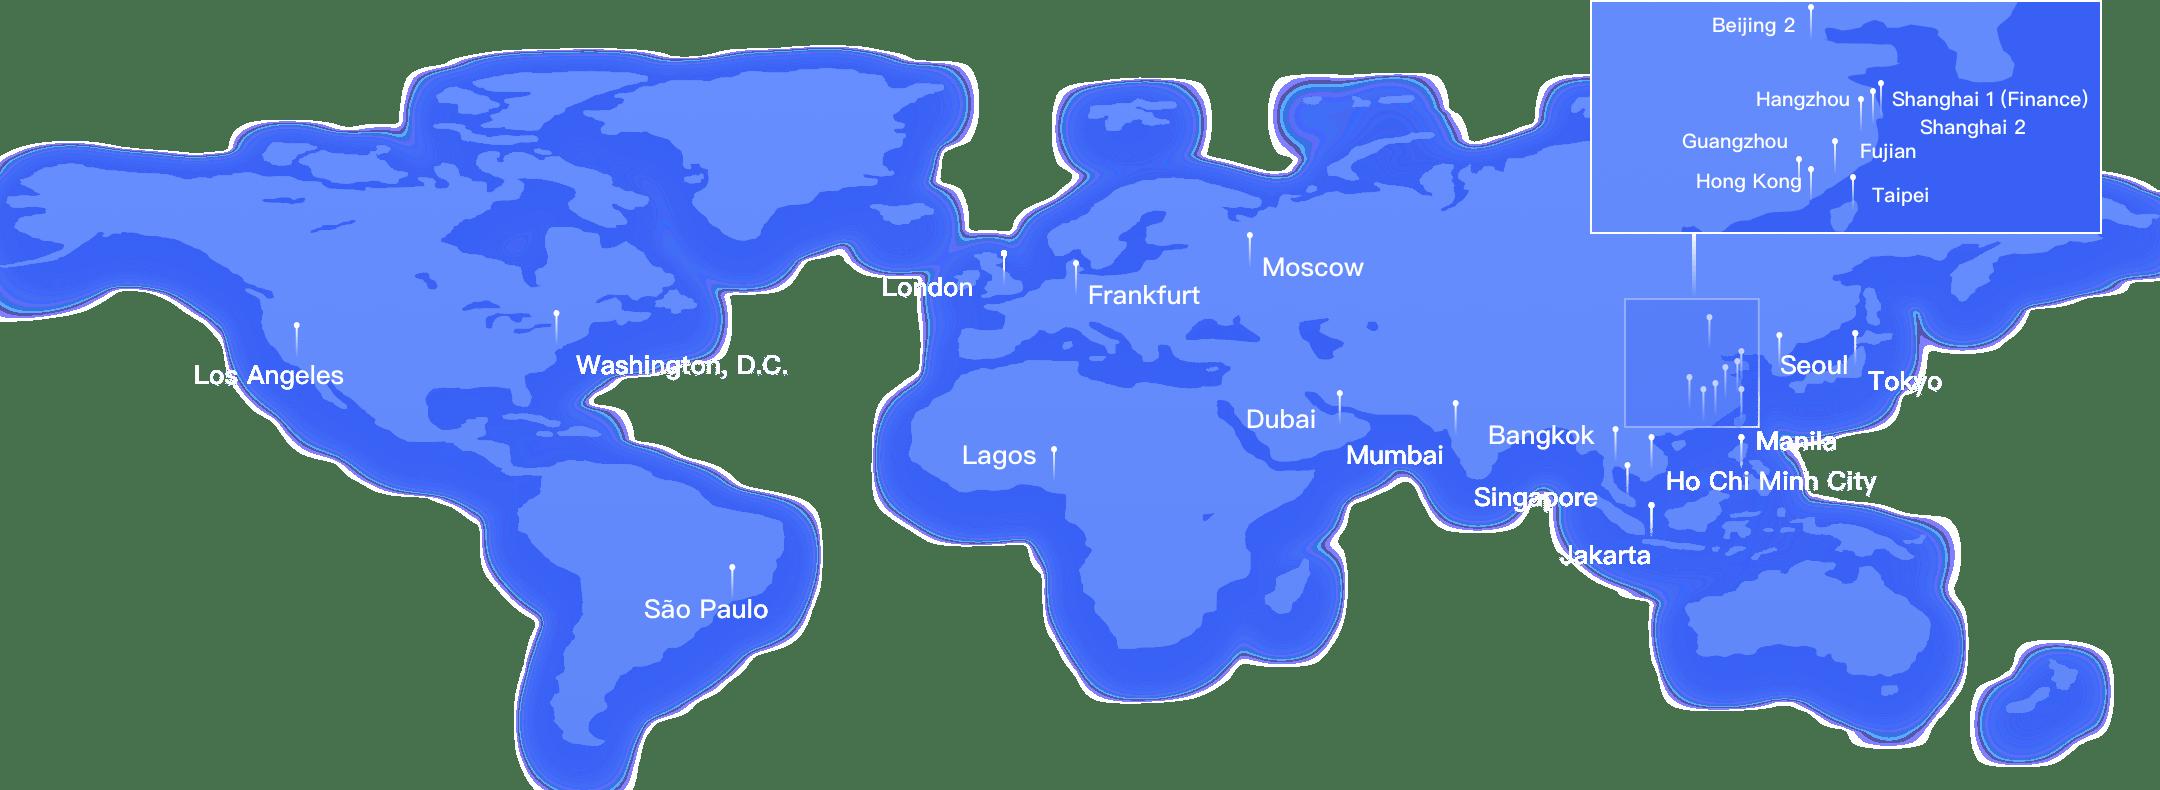 ucloud data map